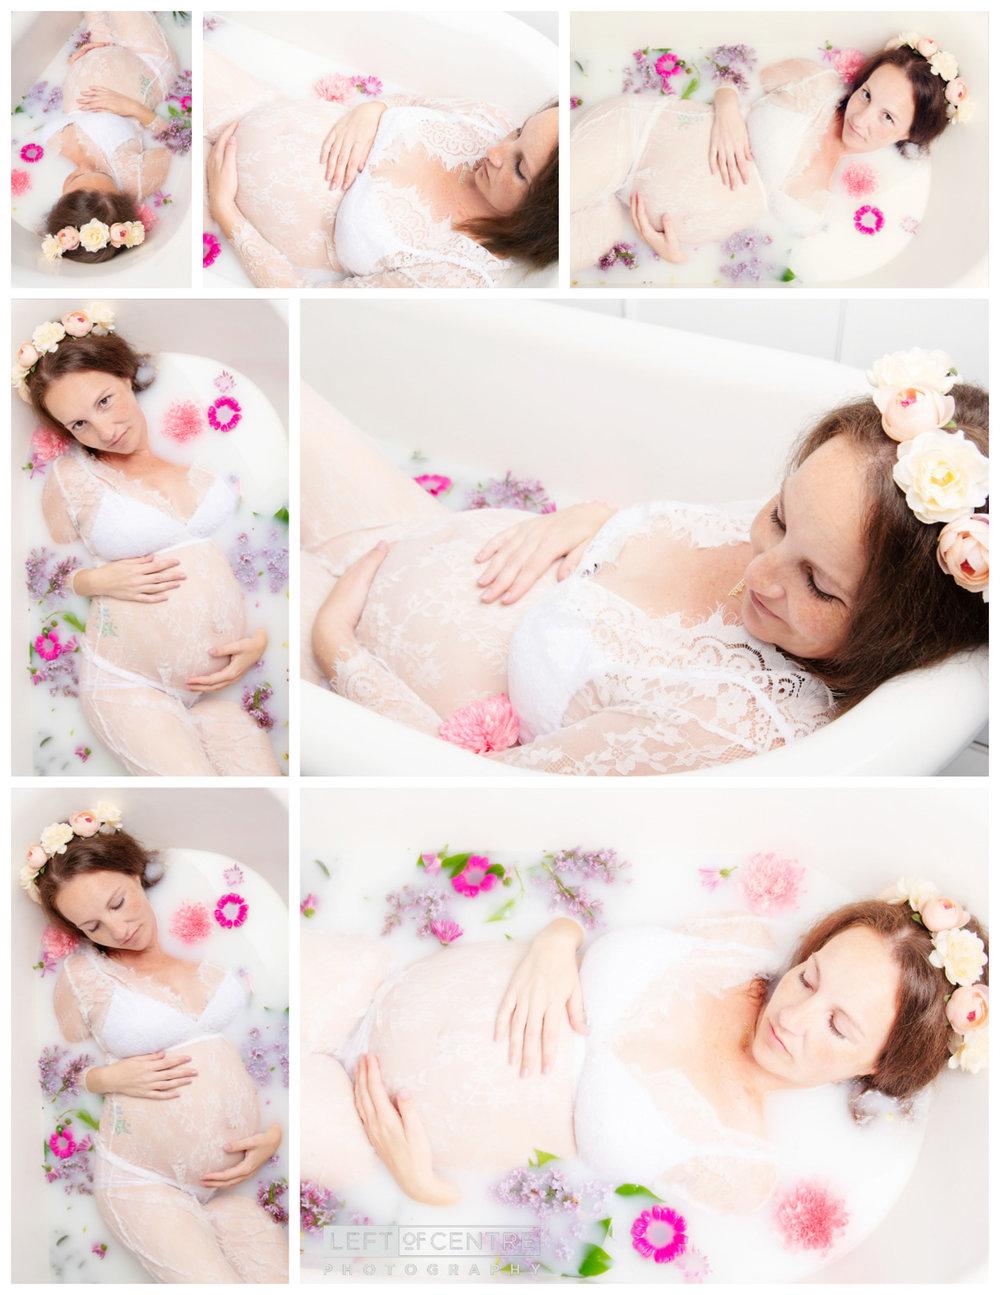 milk bath maternity collage